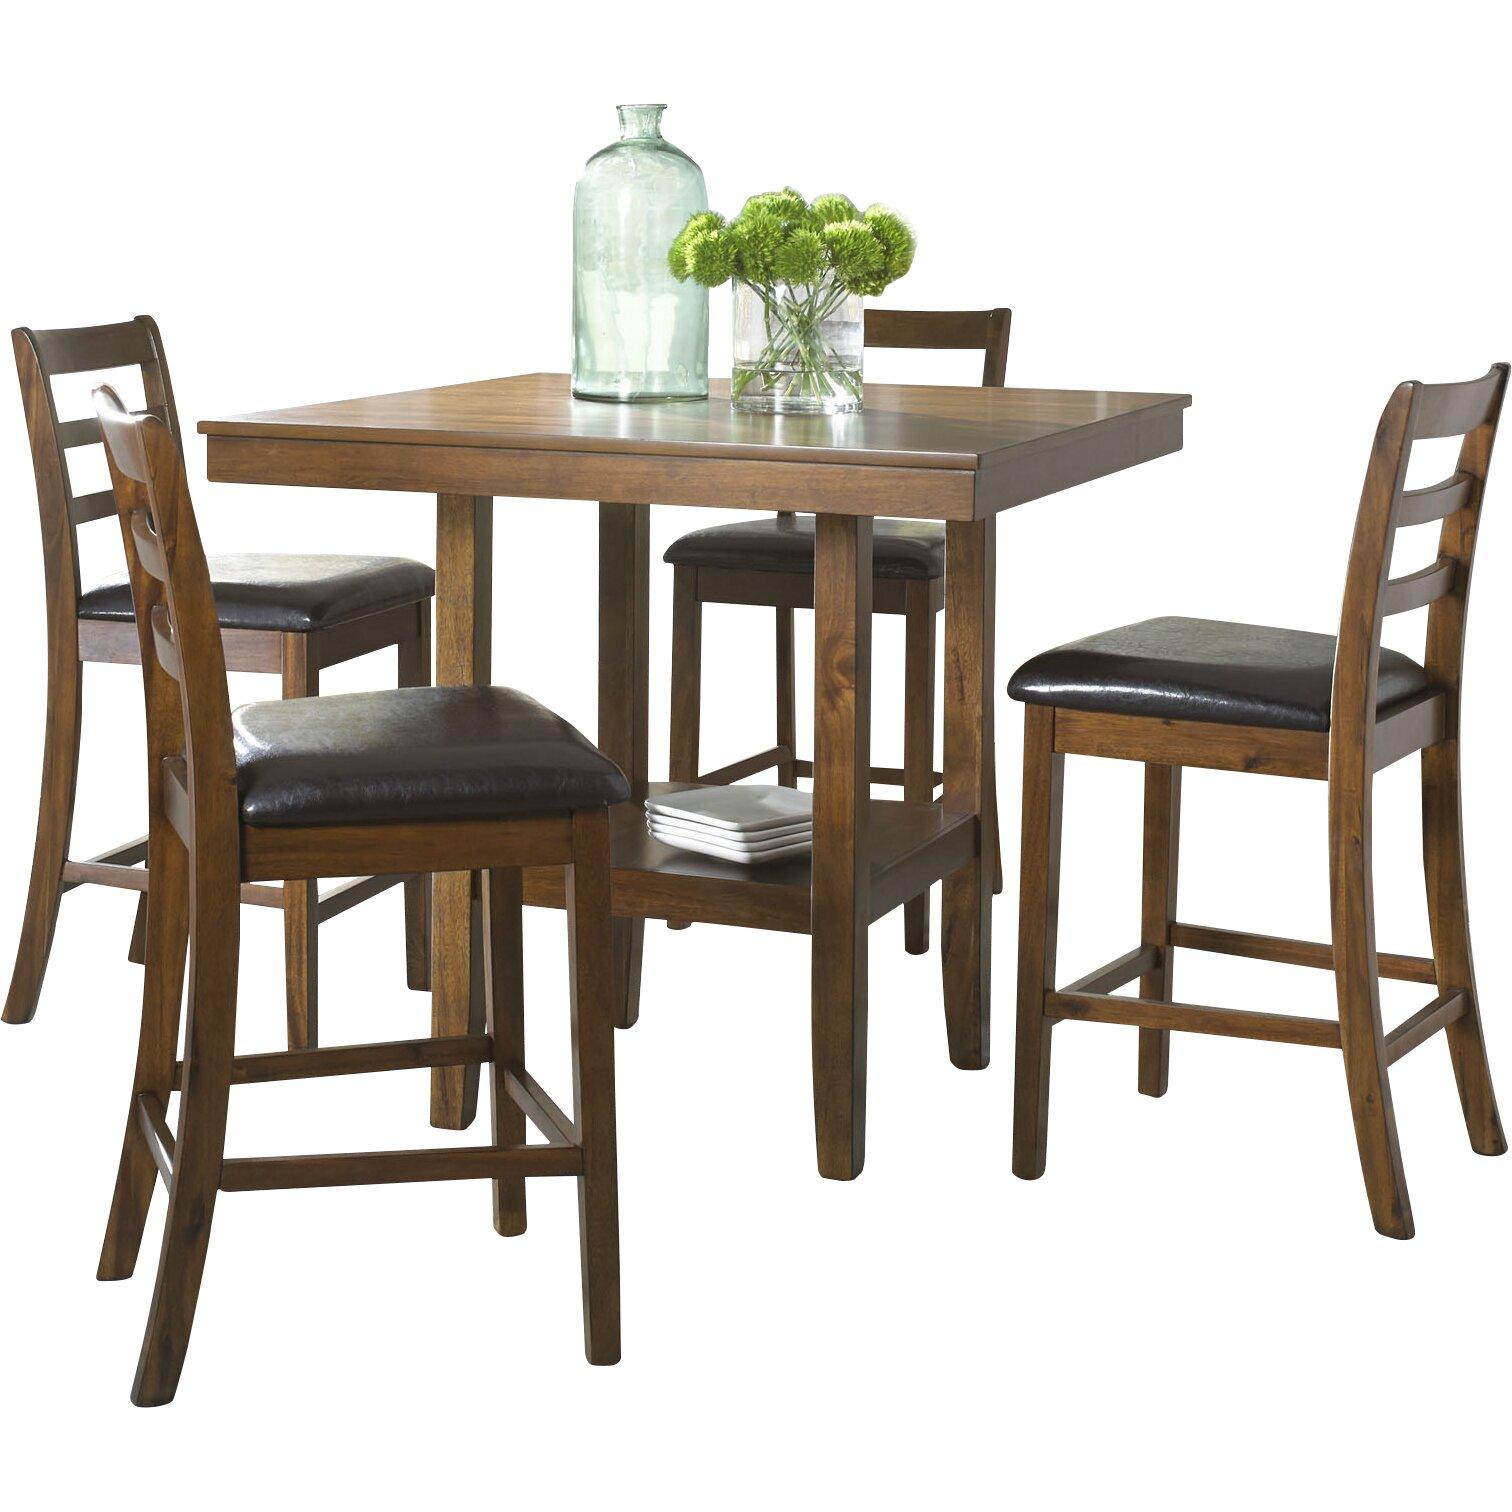 driscoll 5 piece pub table set wayfair. Black Bedroom Furniture Sets. Home Design Ideas